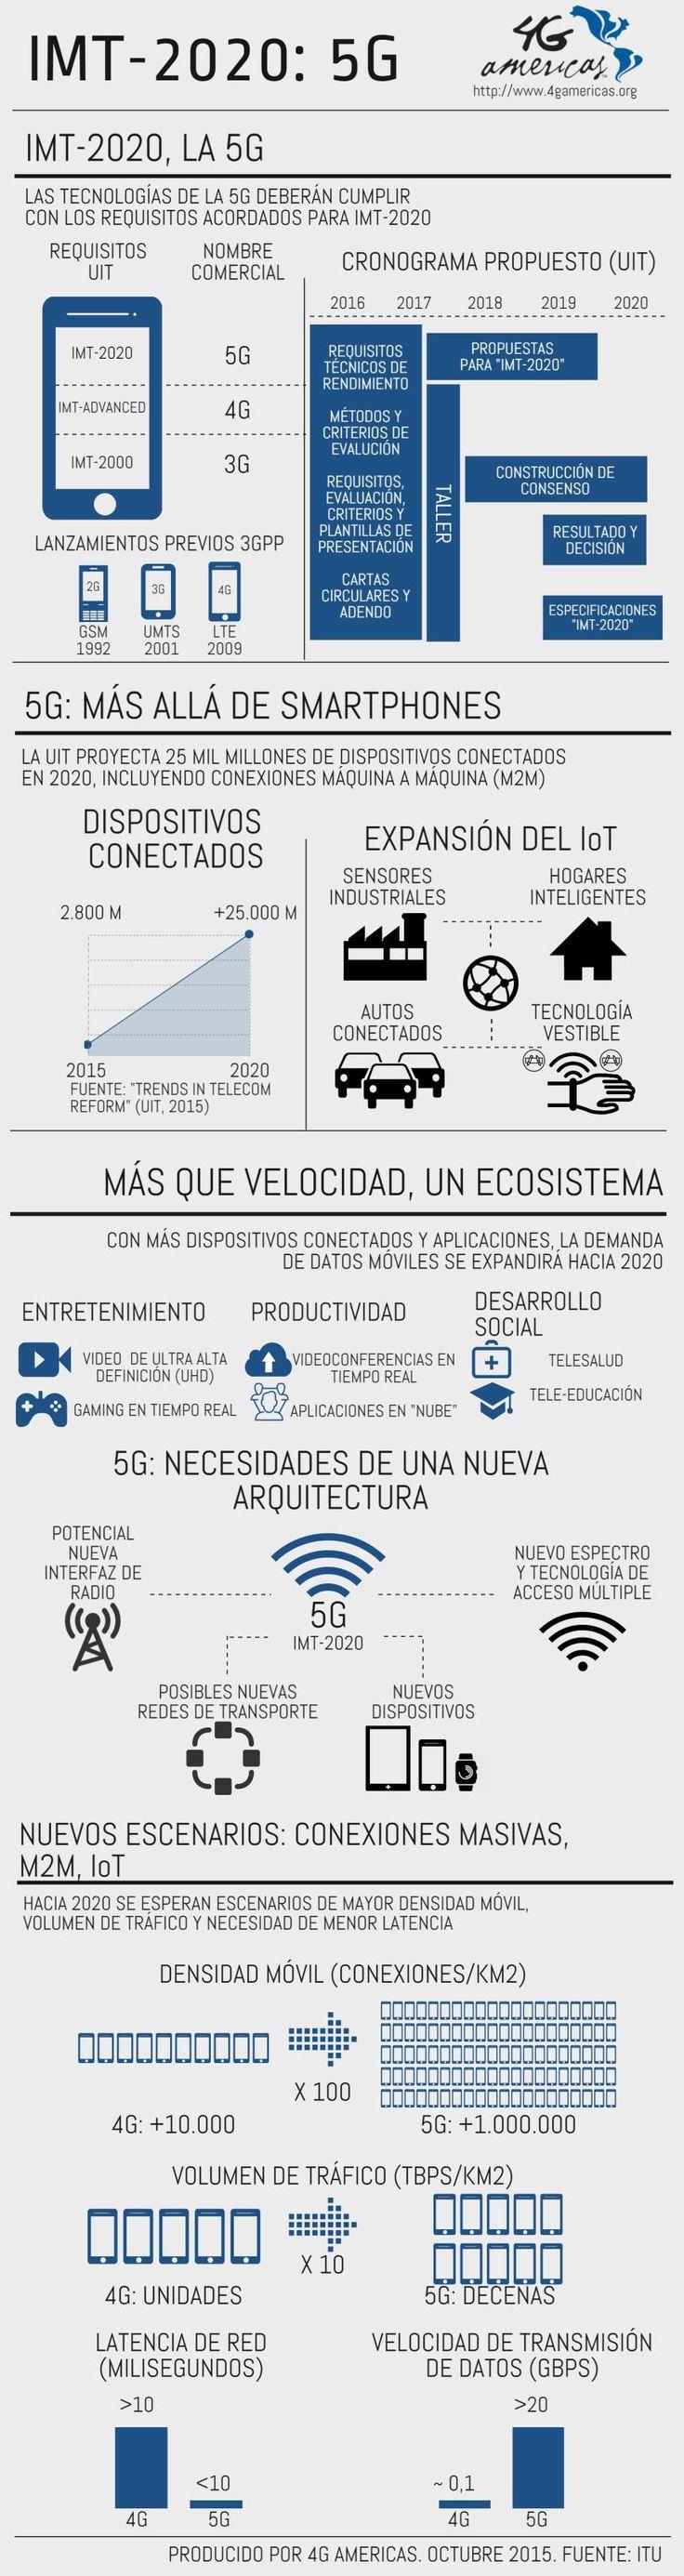 5G: la tecnología que viene #infografia #infographic #tech